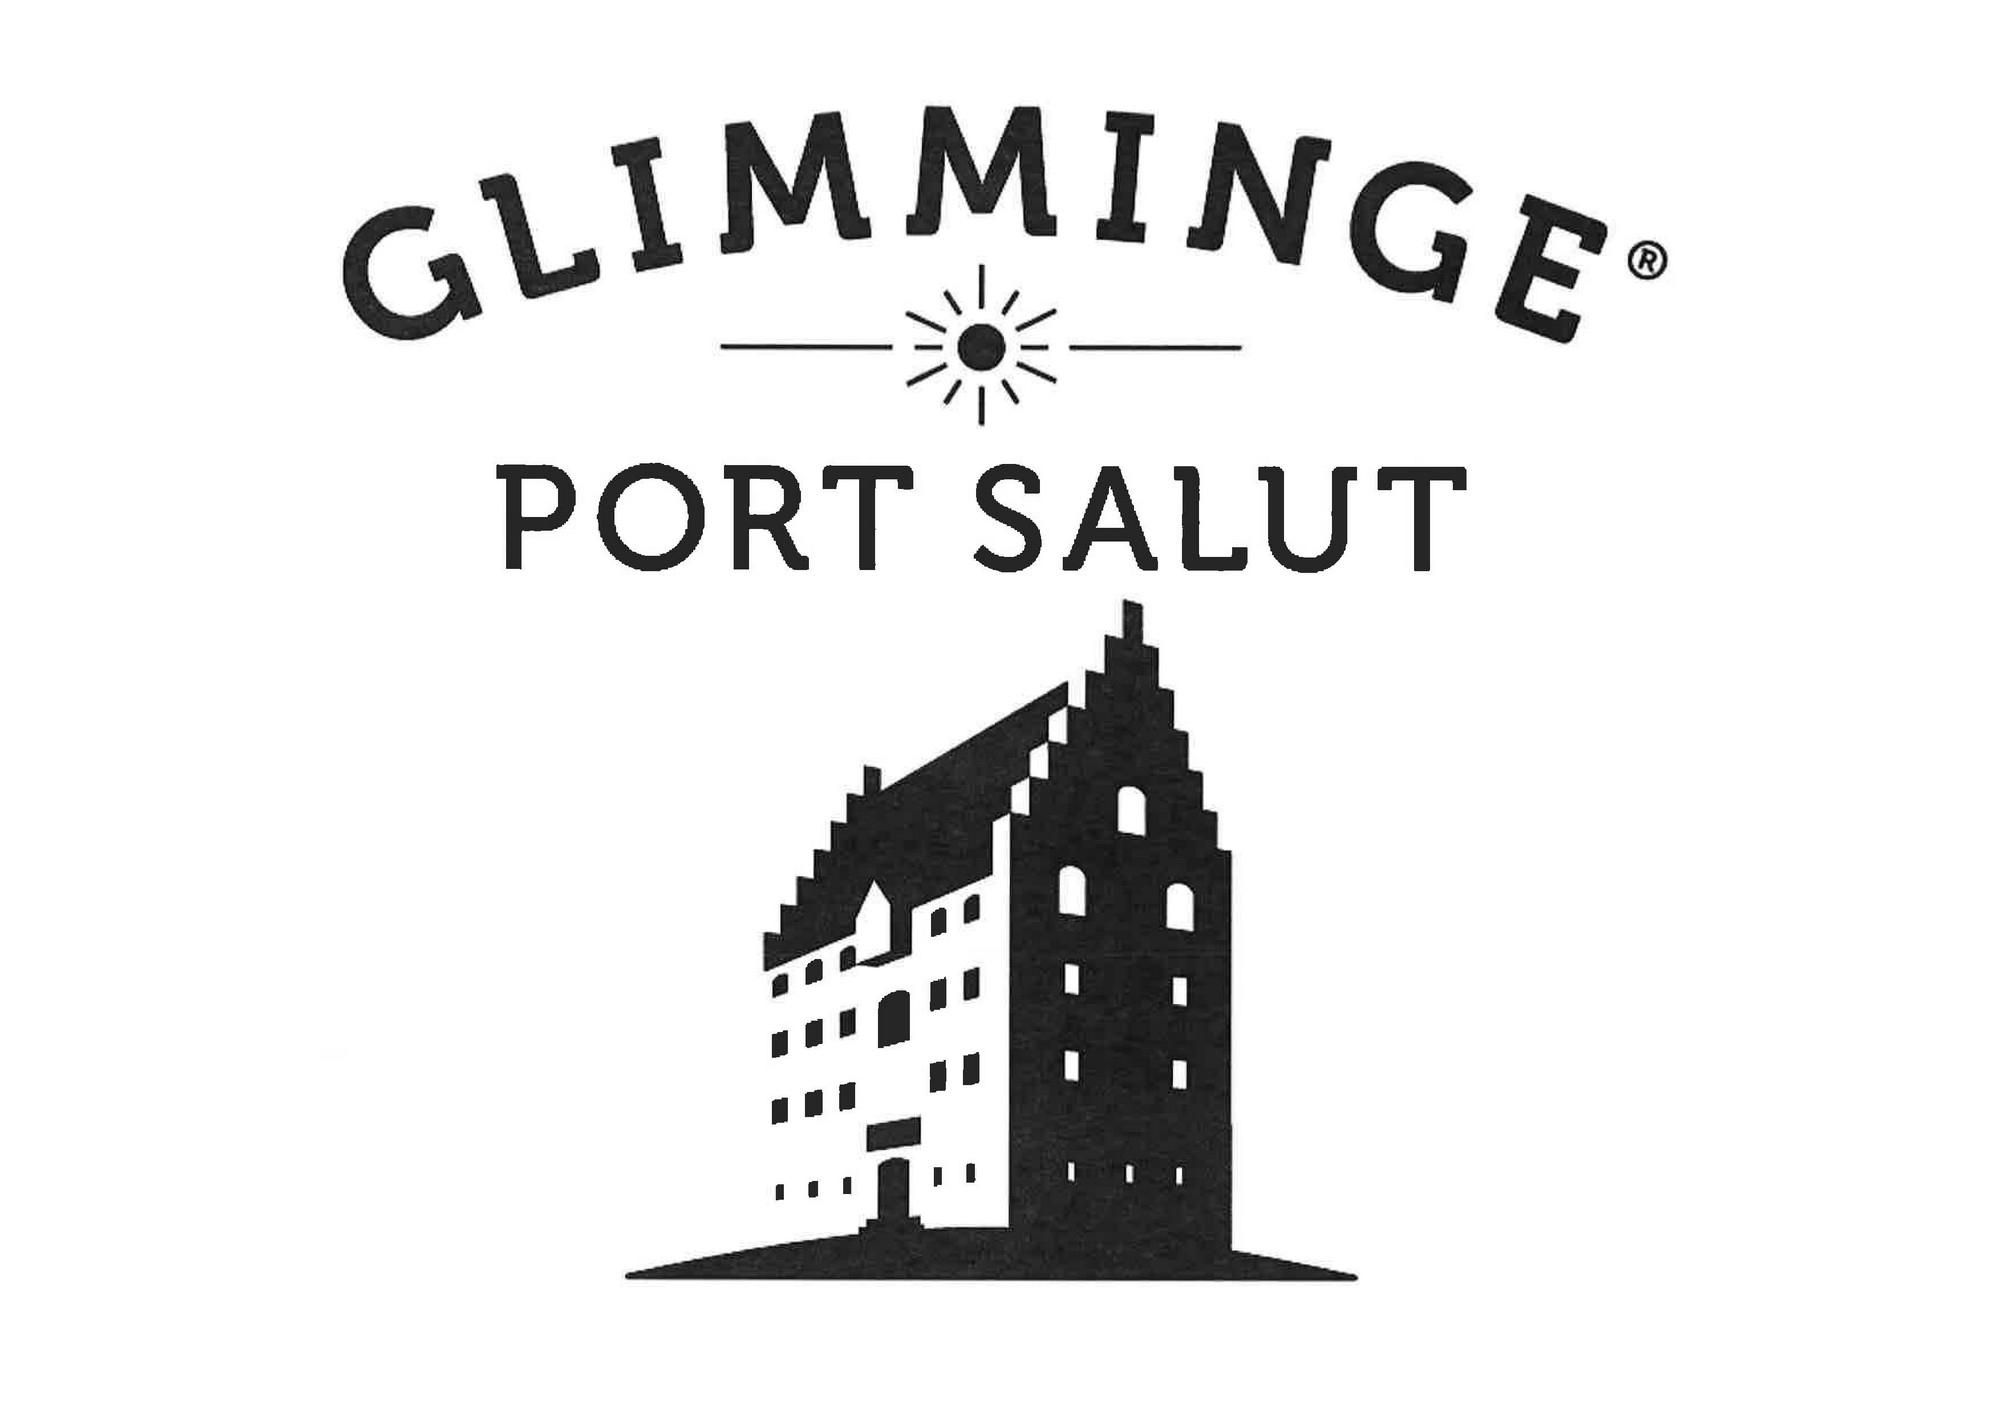 GLIMMINGE PORT SALUT